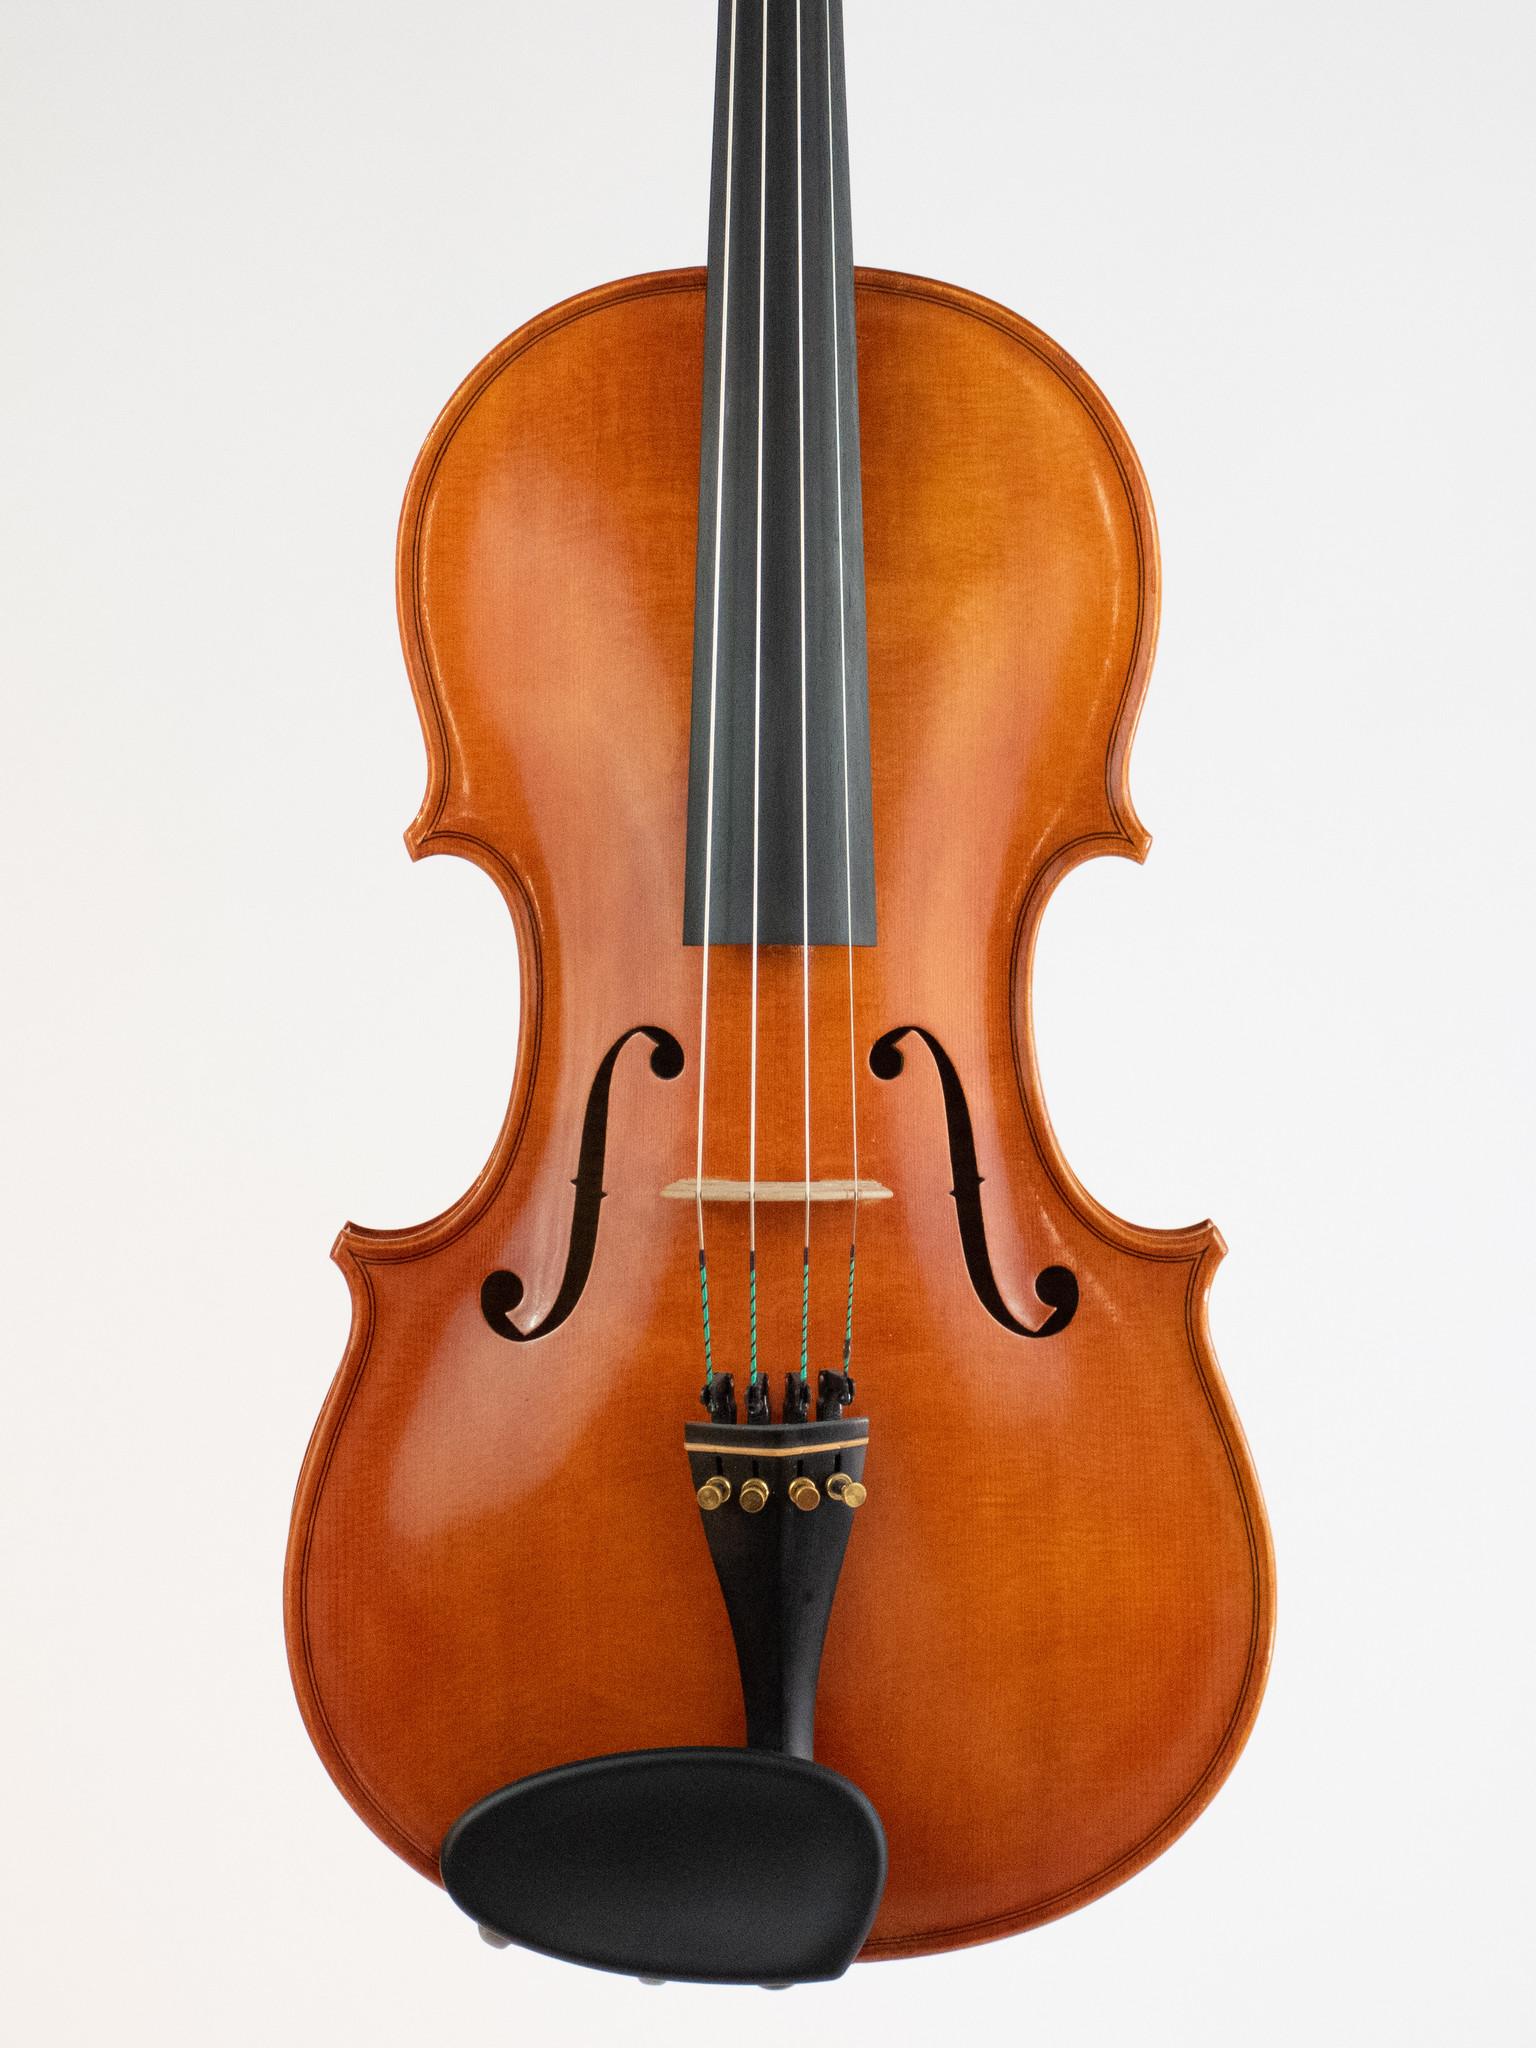 "John Hill 16 1/4"" viola, no. 17, 2006, Eugene, OR, USA"